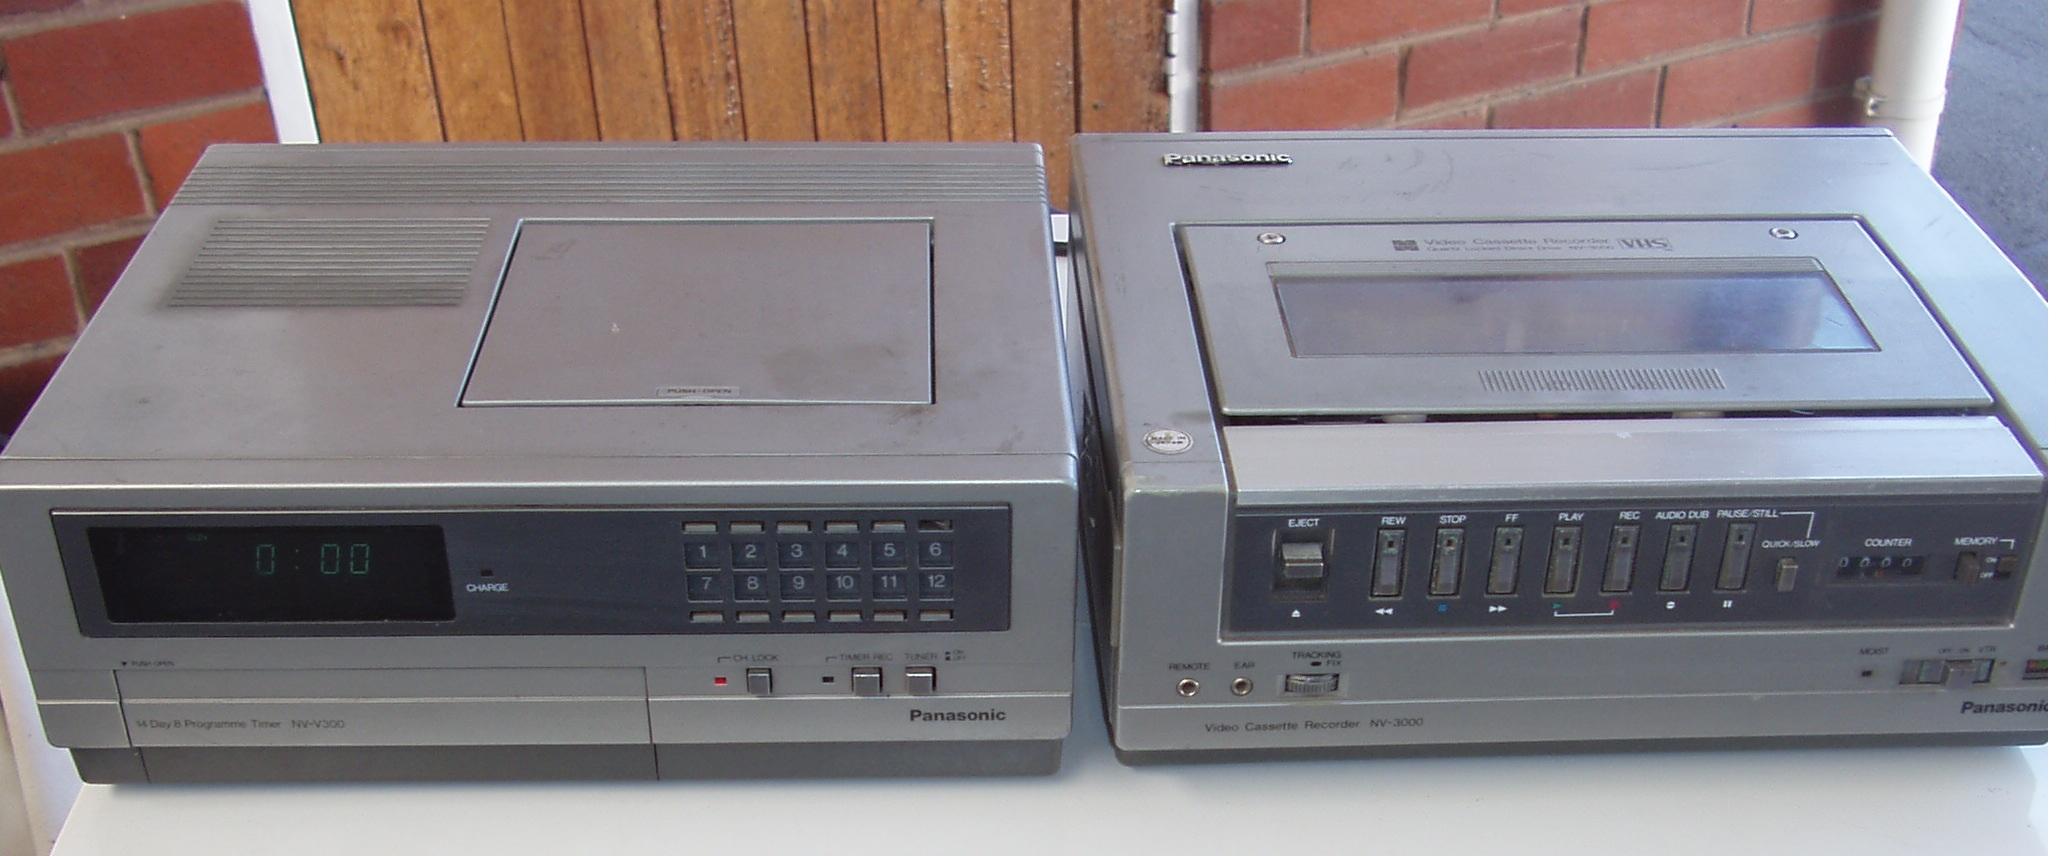 Panasonic Video Recording Equipment - in good condition